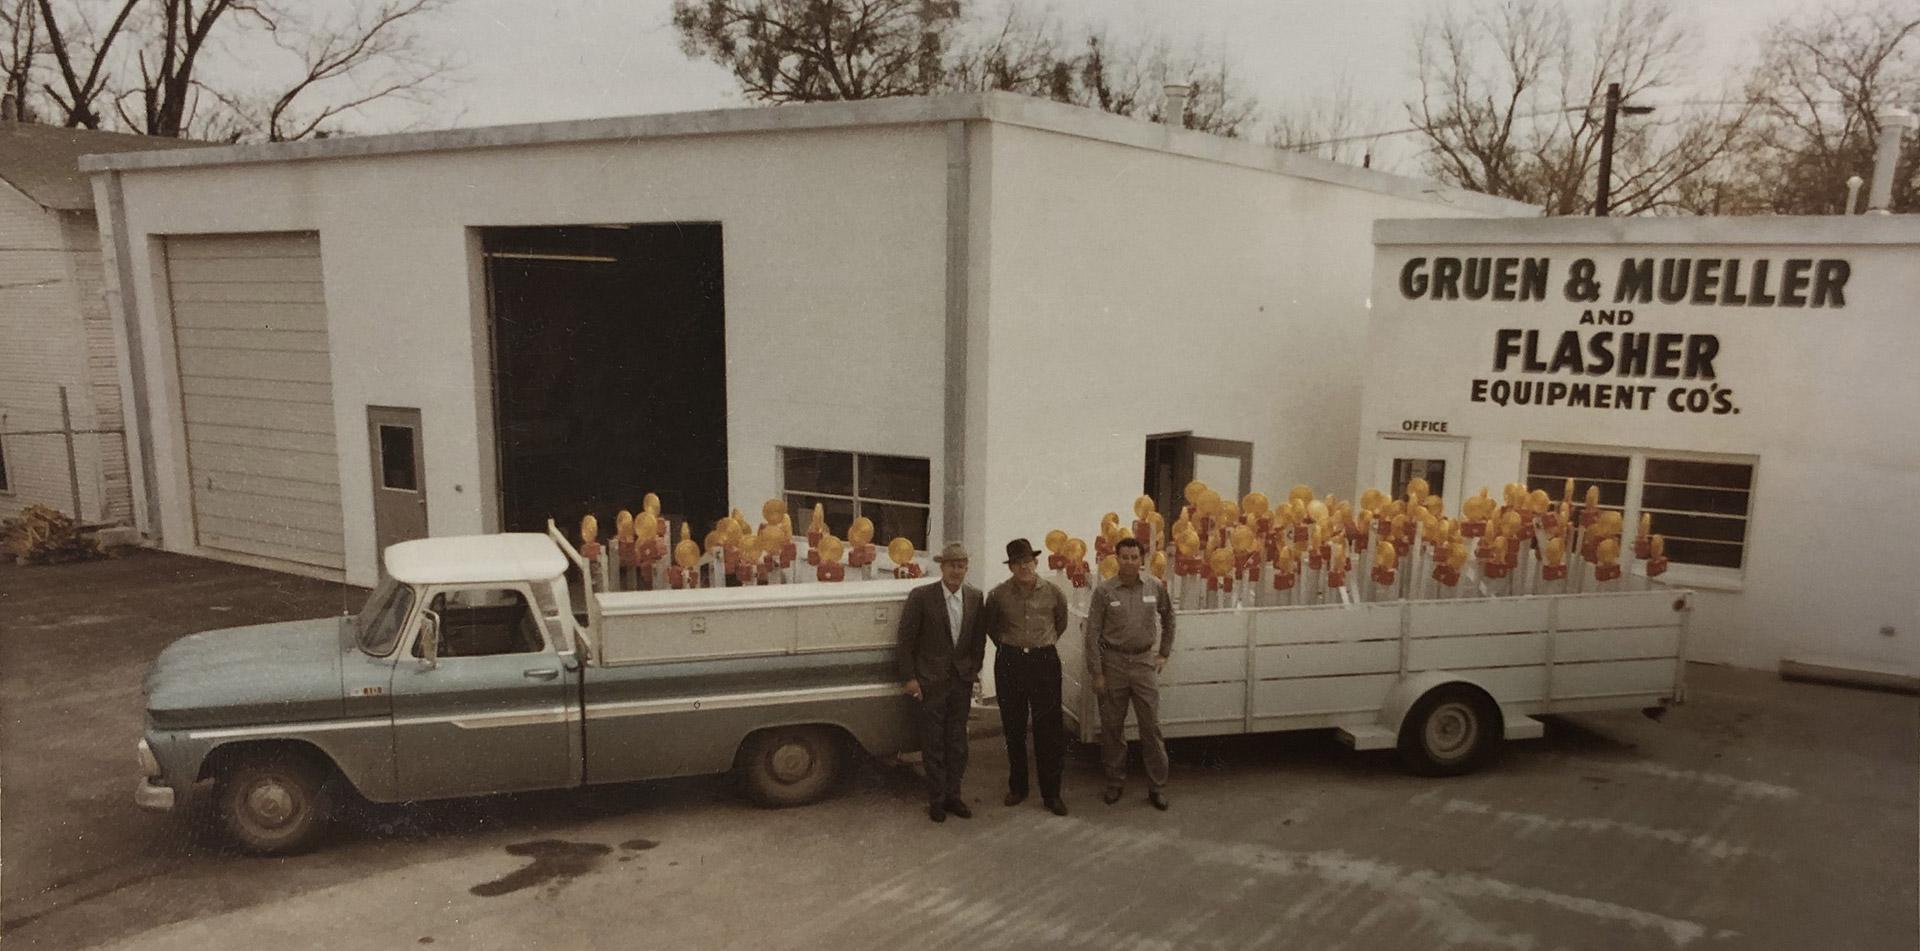 Flasher Equipment Company